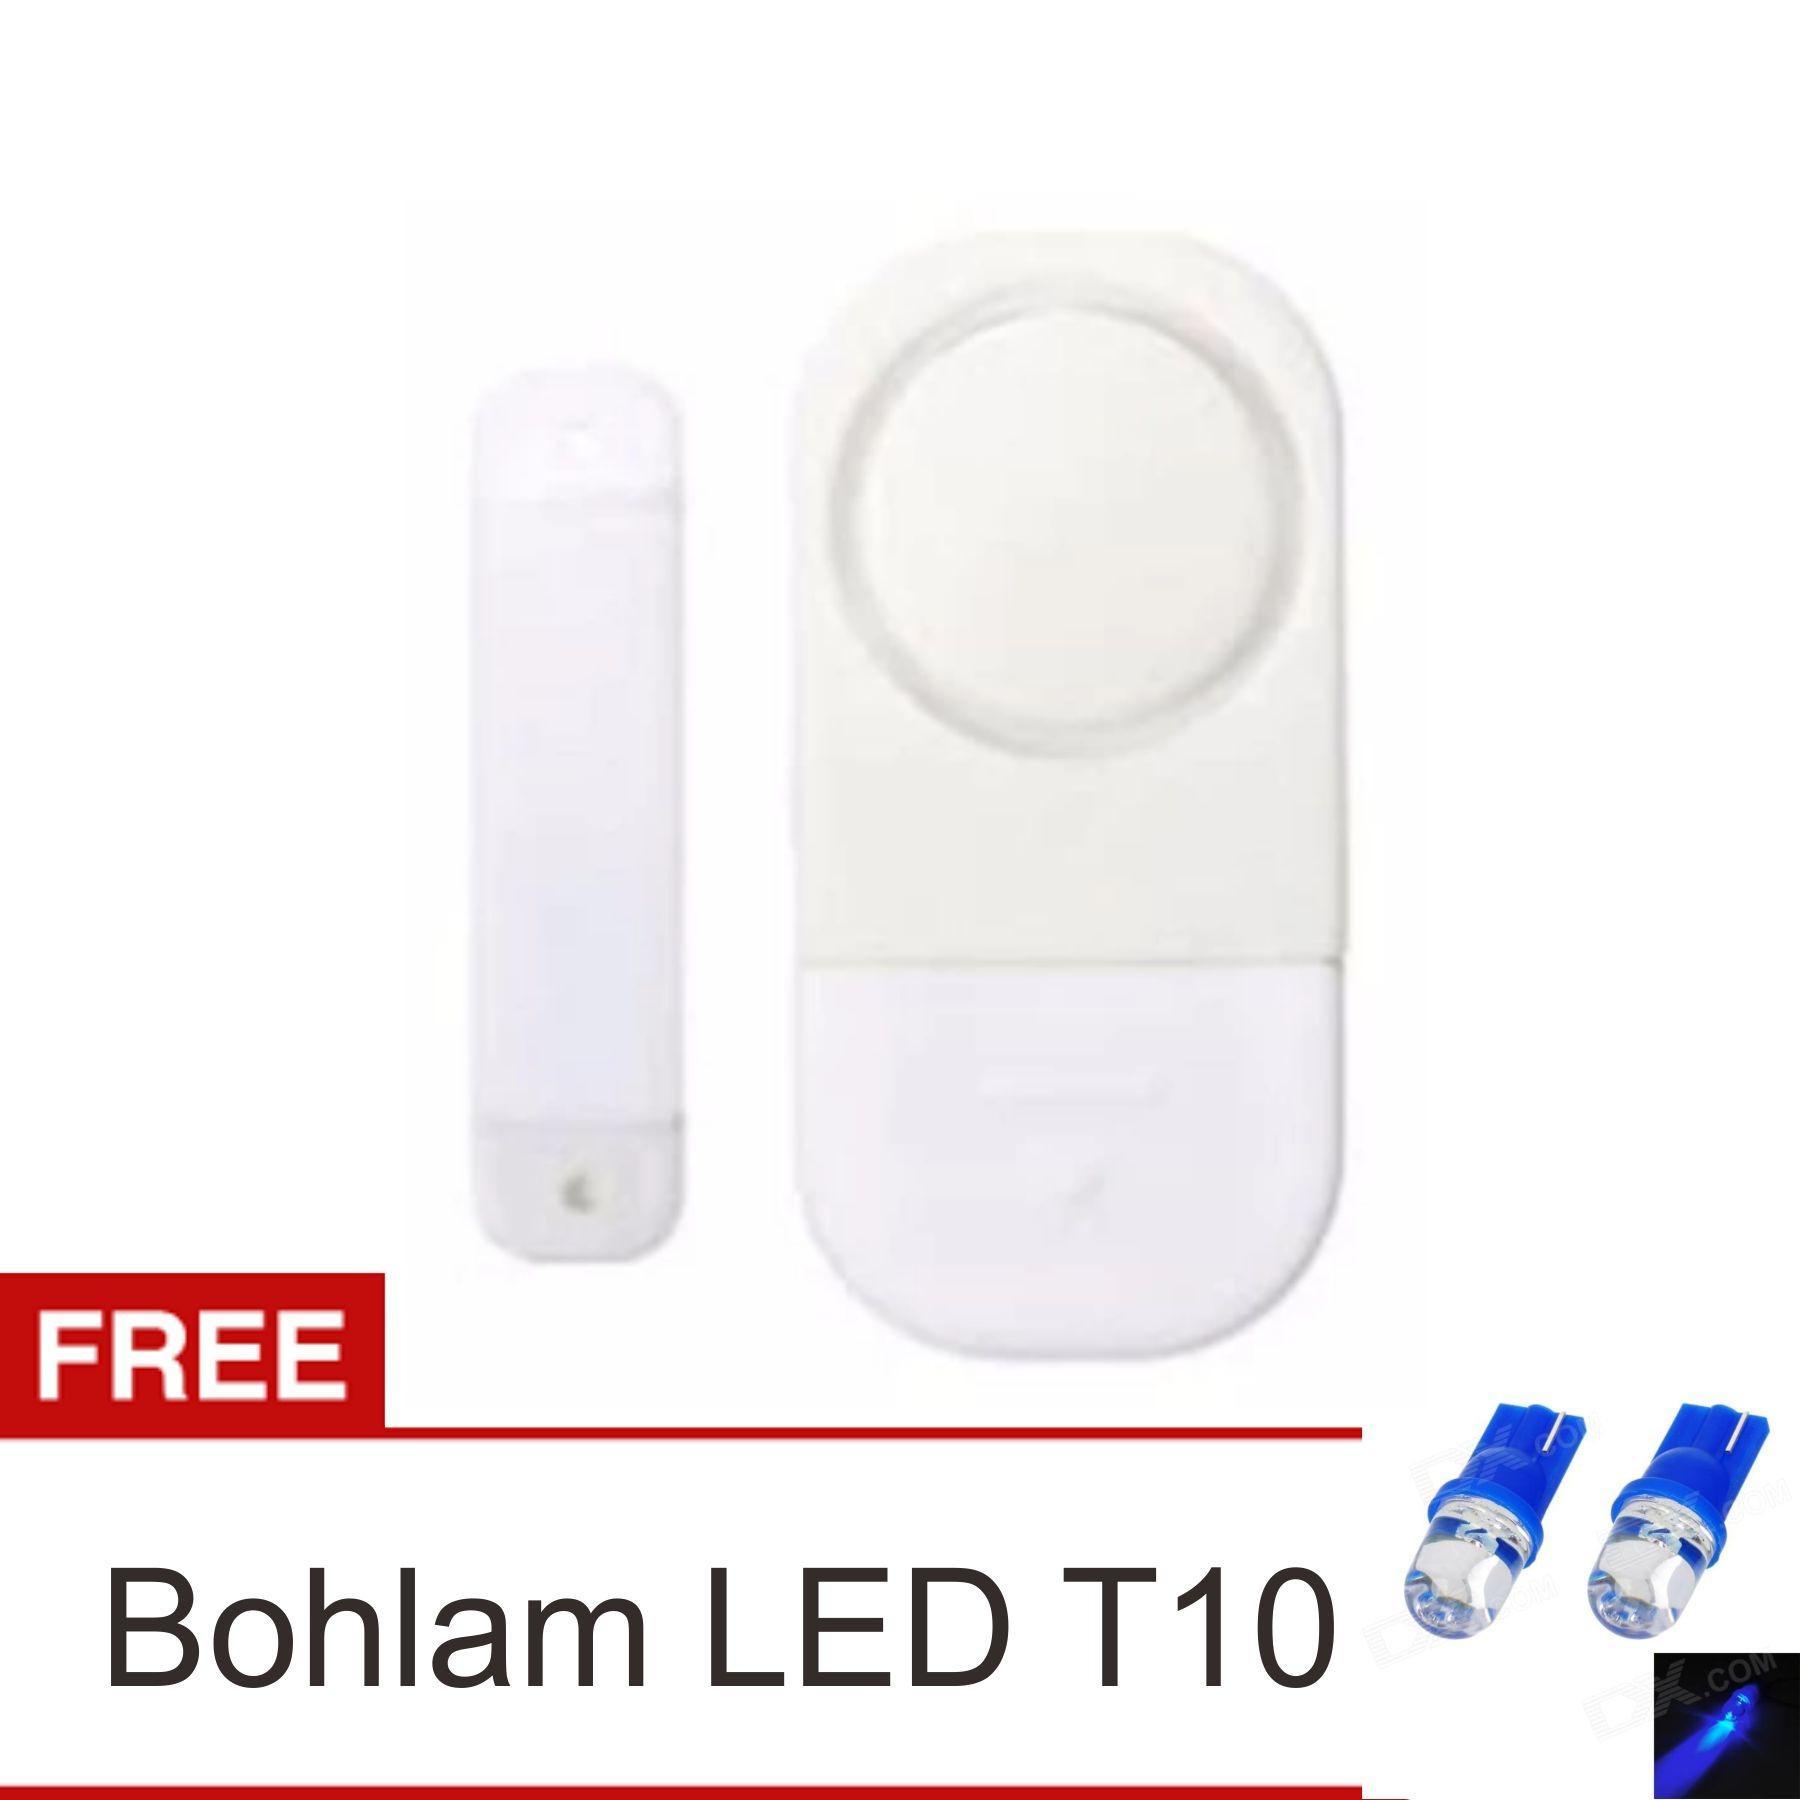 Pencarian Termurah lanjar jaya Alarm Pintu Jendela Rumah Anti Maling - Door Window Entry Alarm + Bohlma LED T10 harga penawaran - Hanya Rp13.152